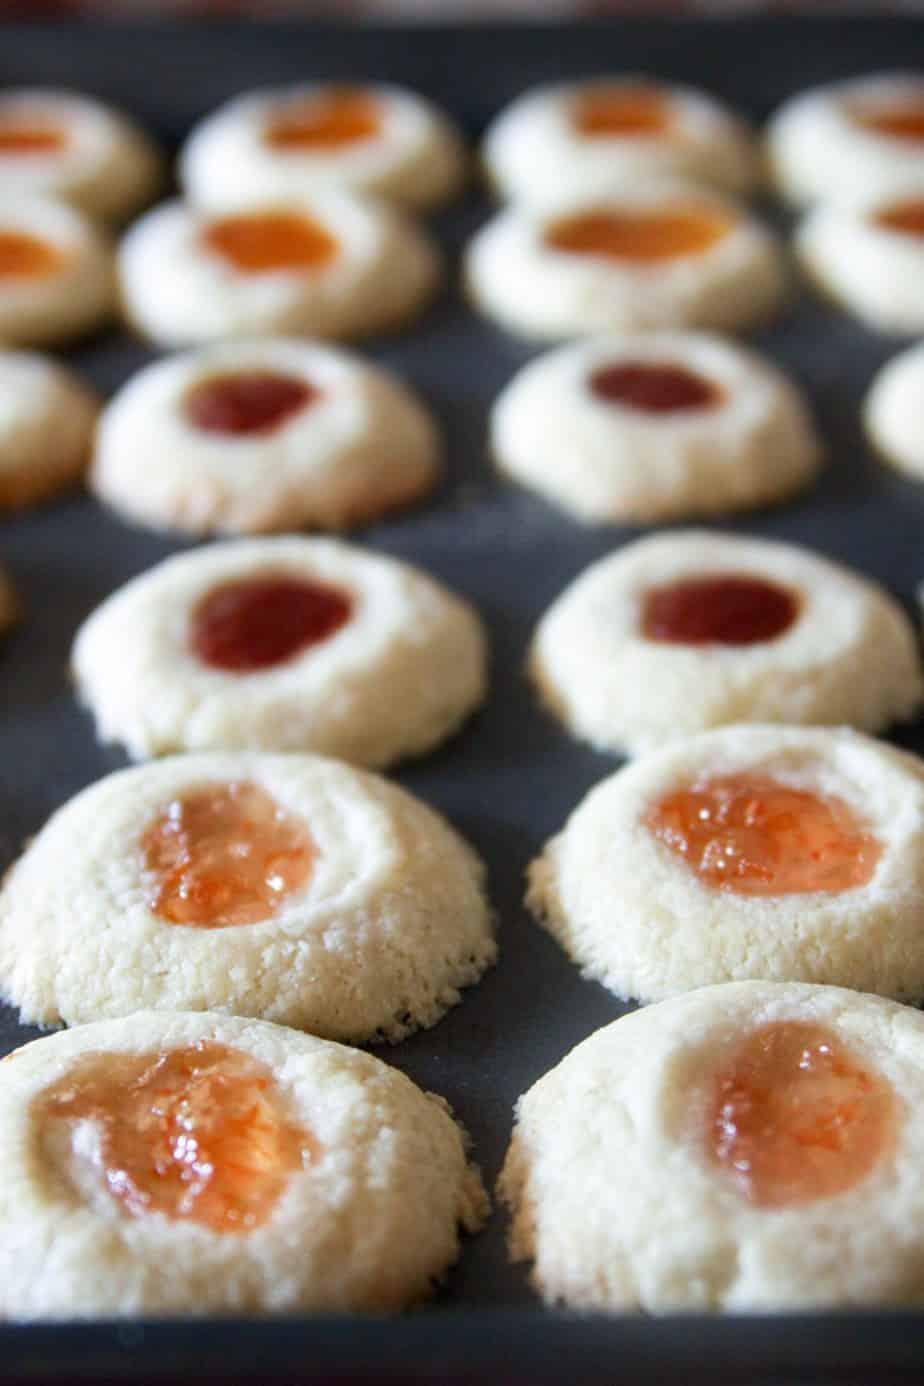 Shortbread & Jam Thumbprint Cookies